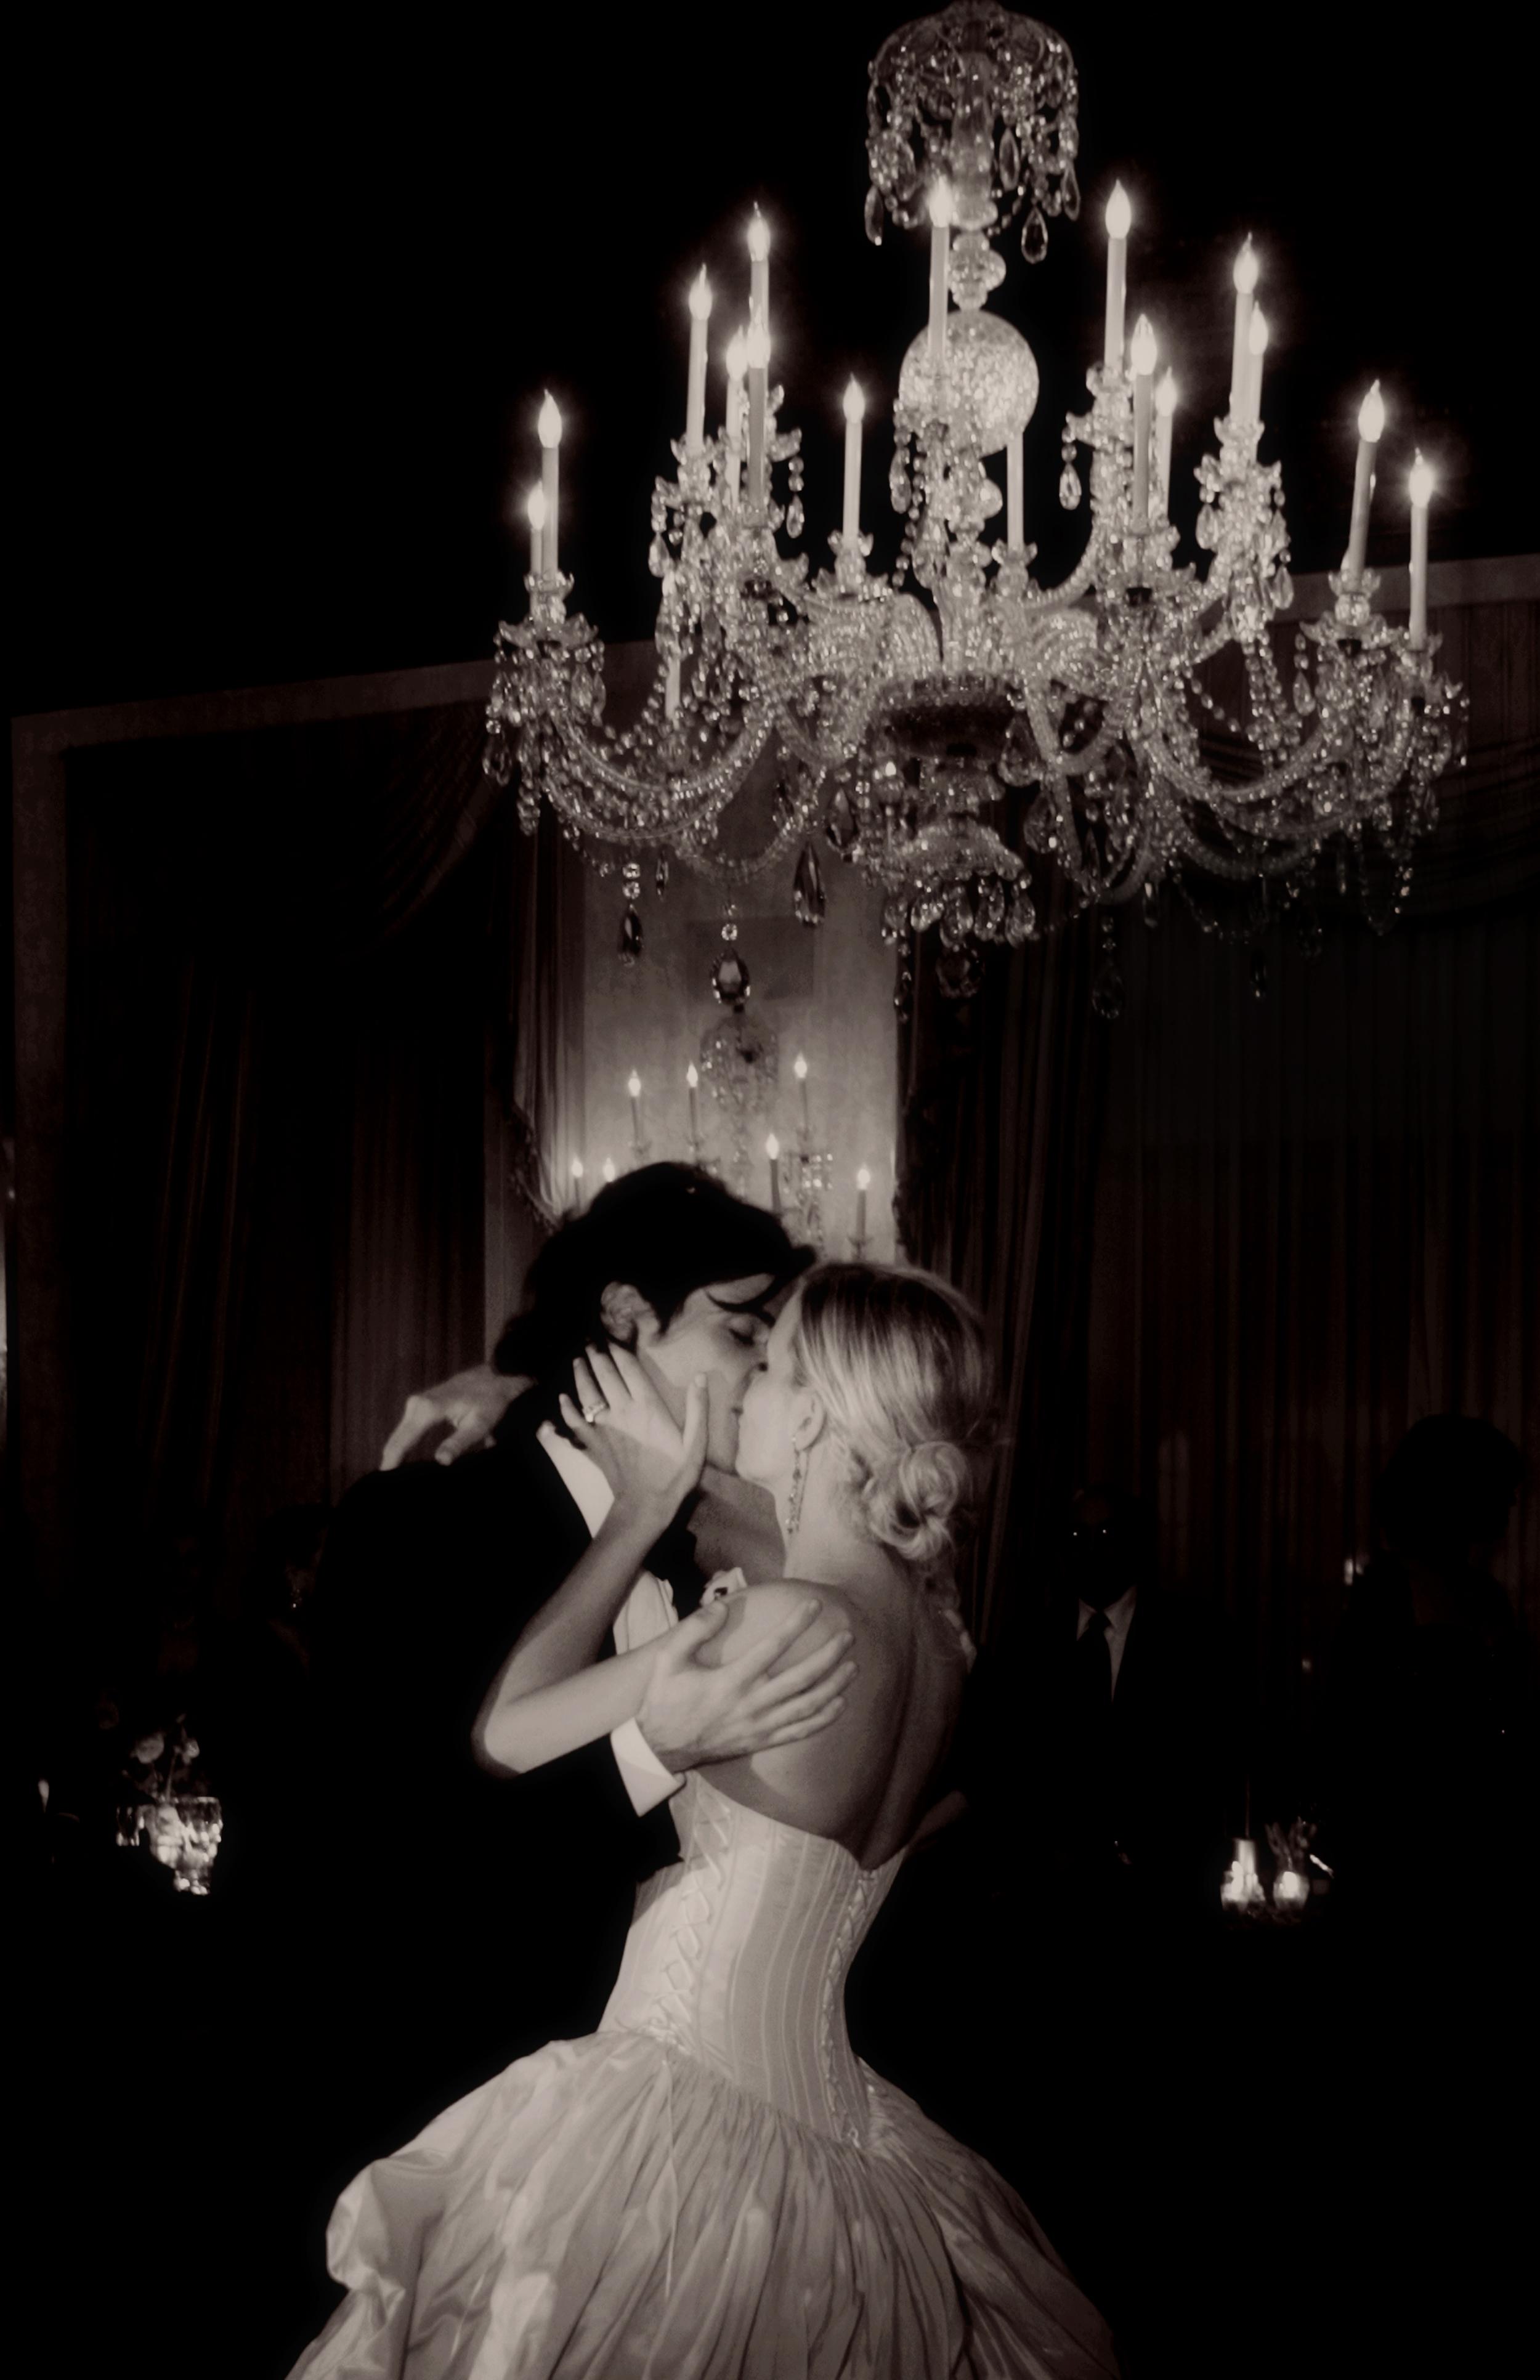 ROMANCE ON THE DANCE FLOOR